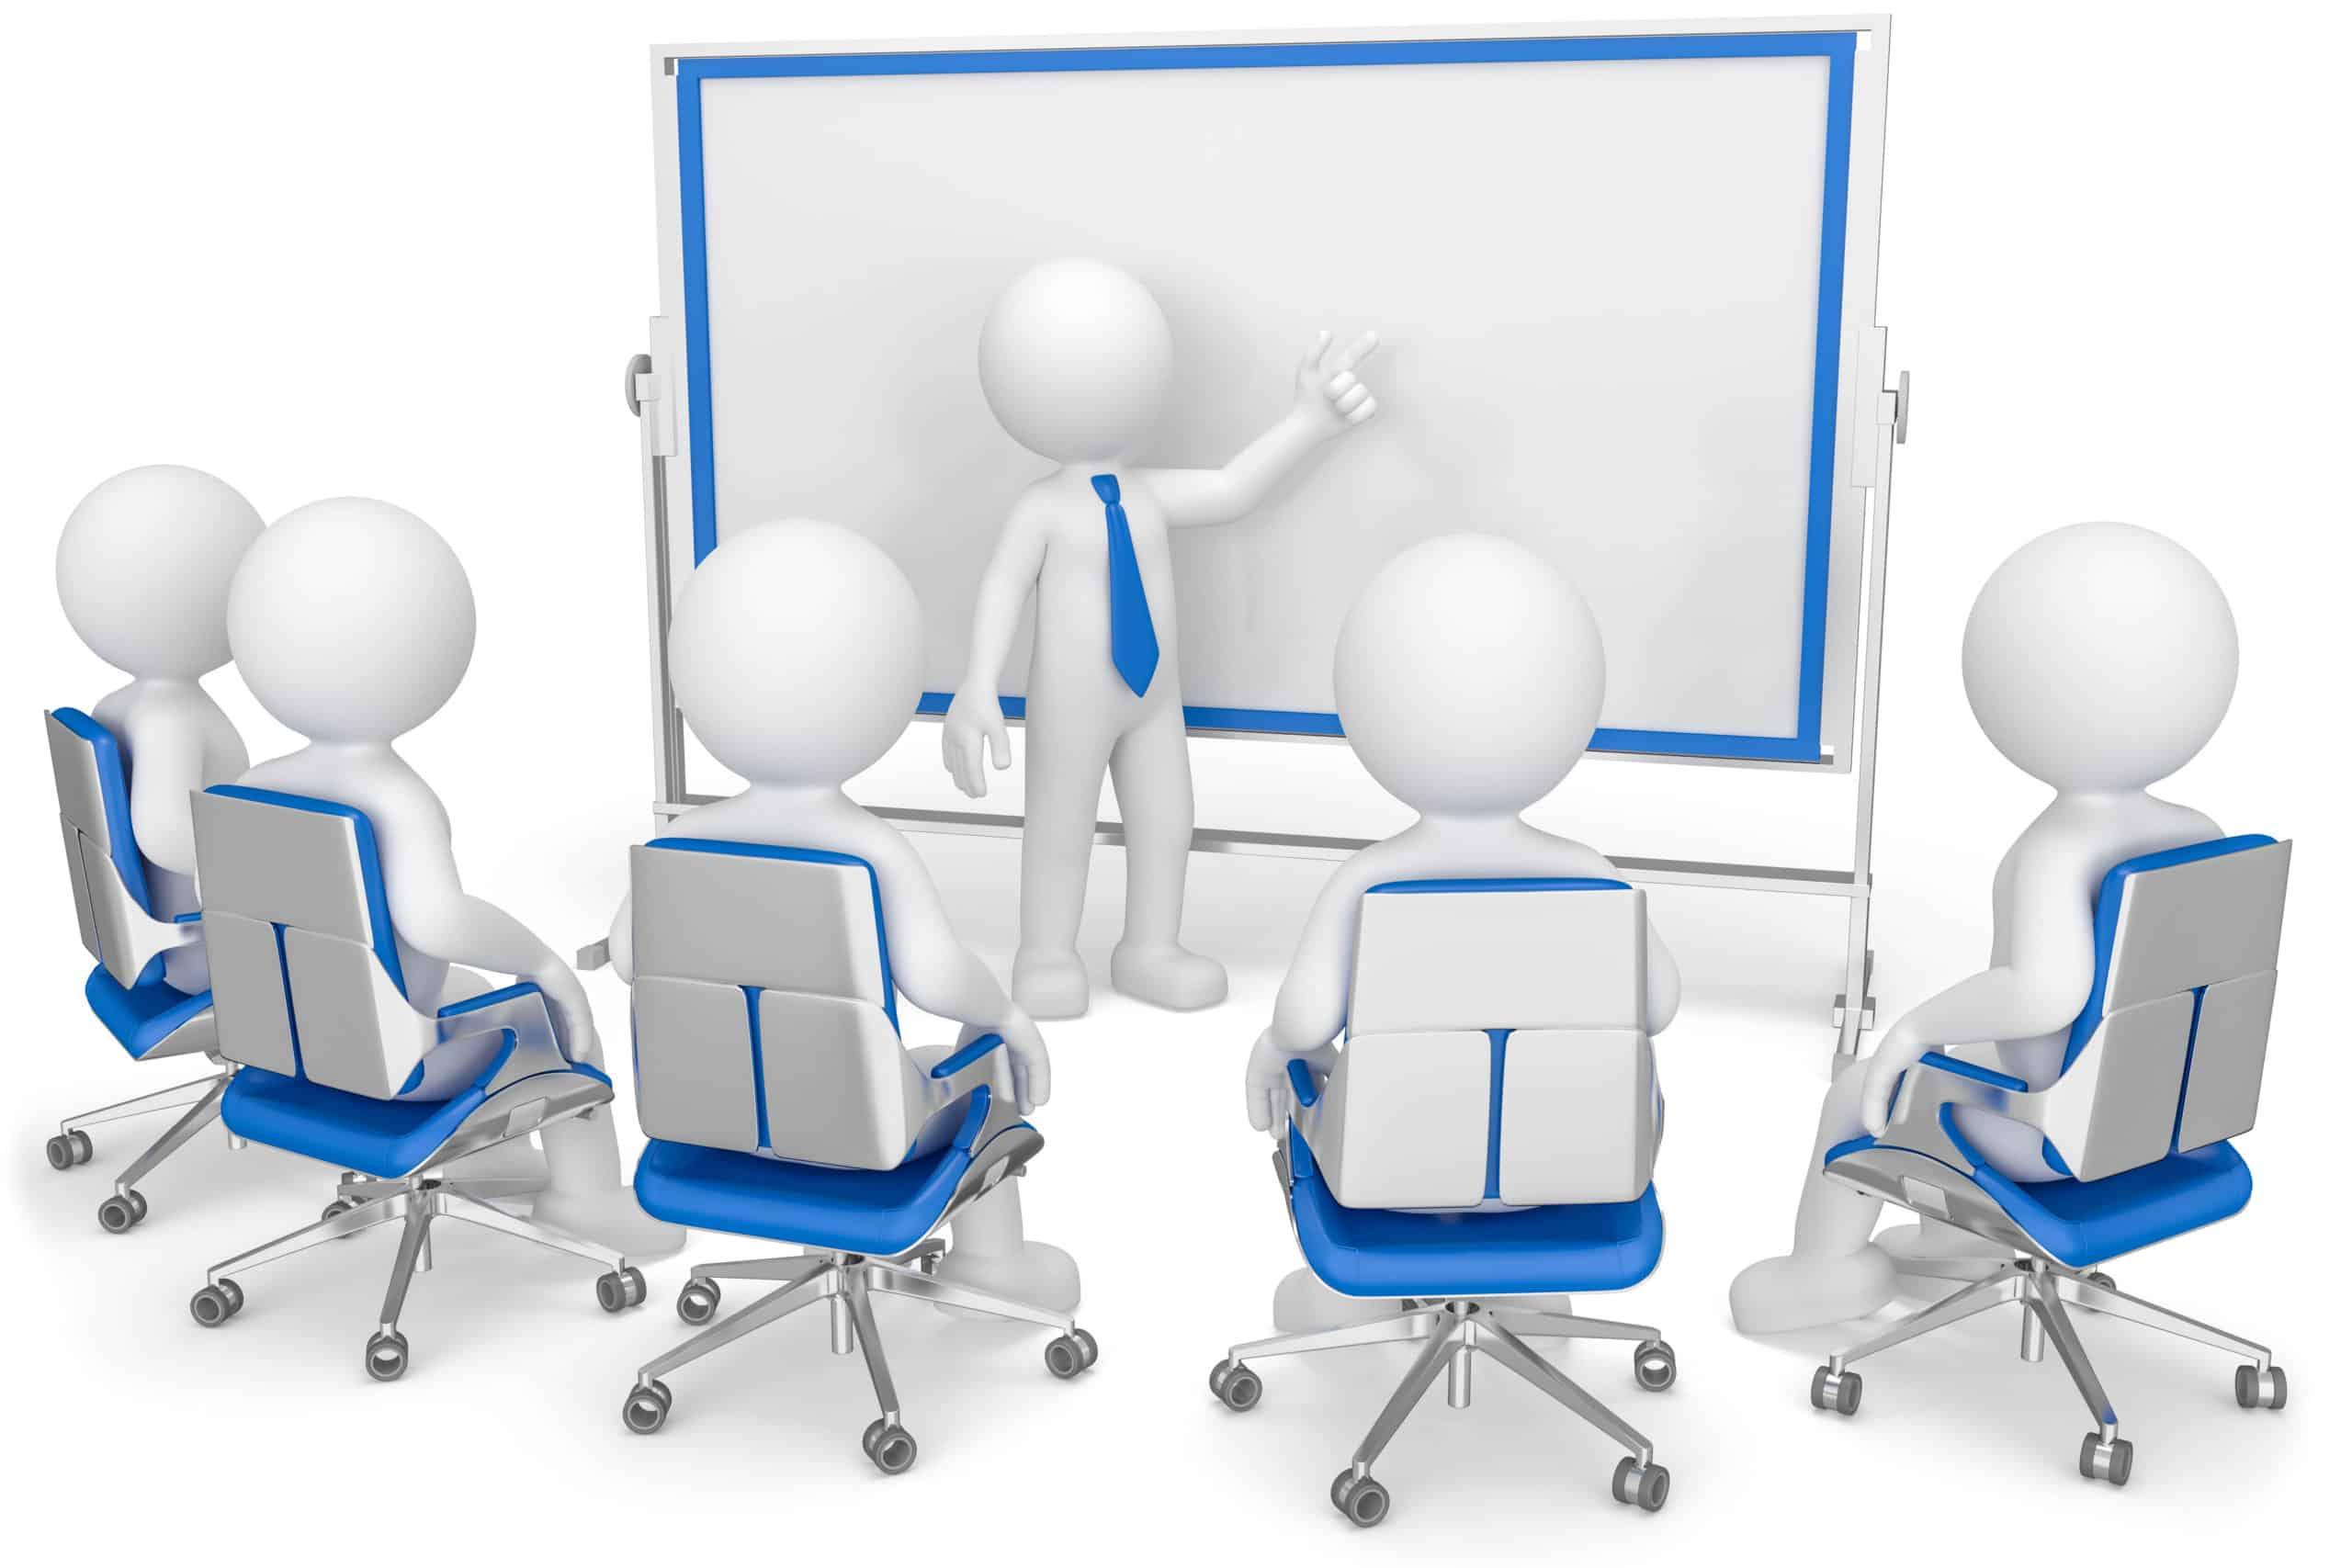 szkolenia i konferencje luty 2020